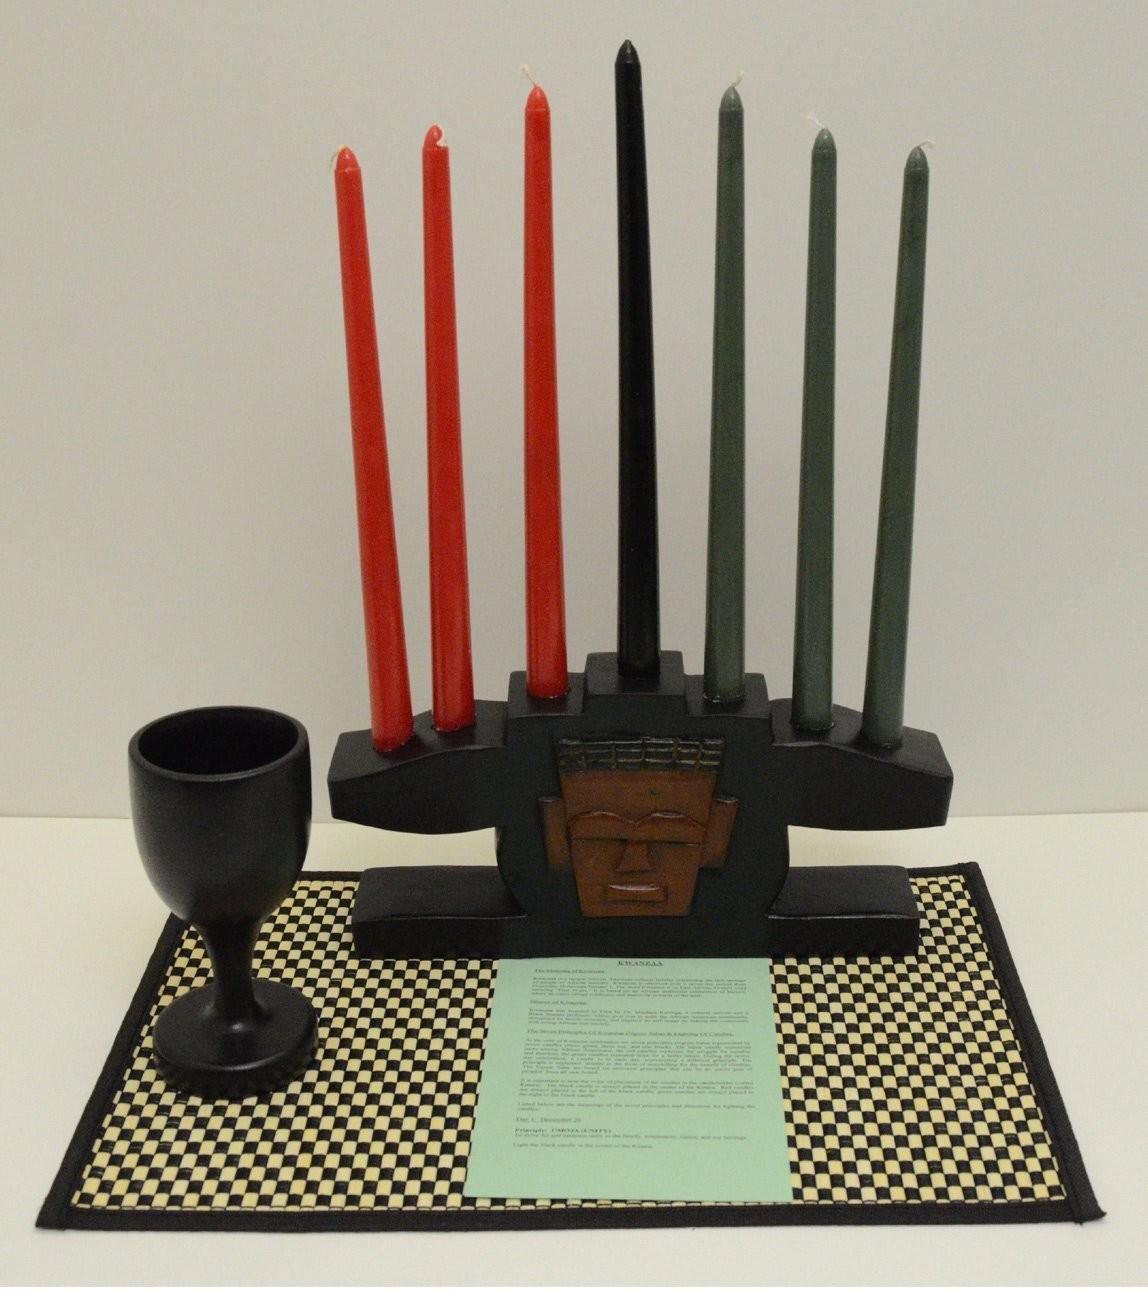 Kwanzaa Mask Candleholder & Celebration Set (Black) - Made in Ghana